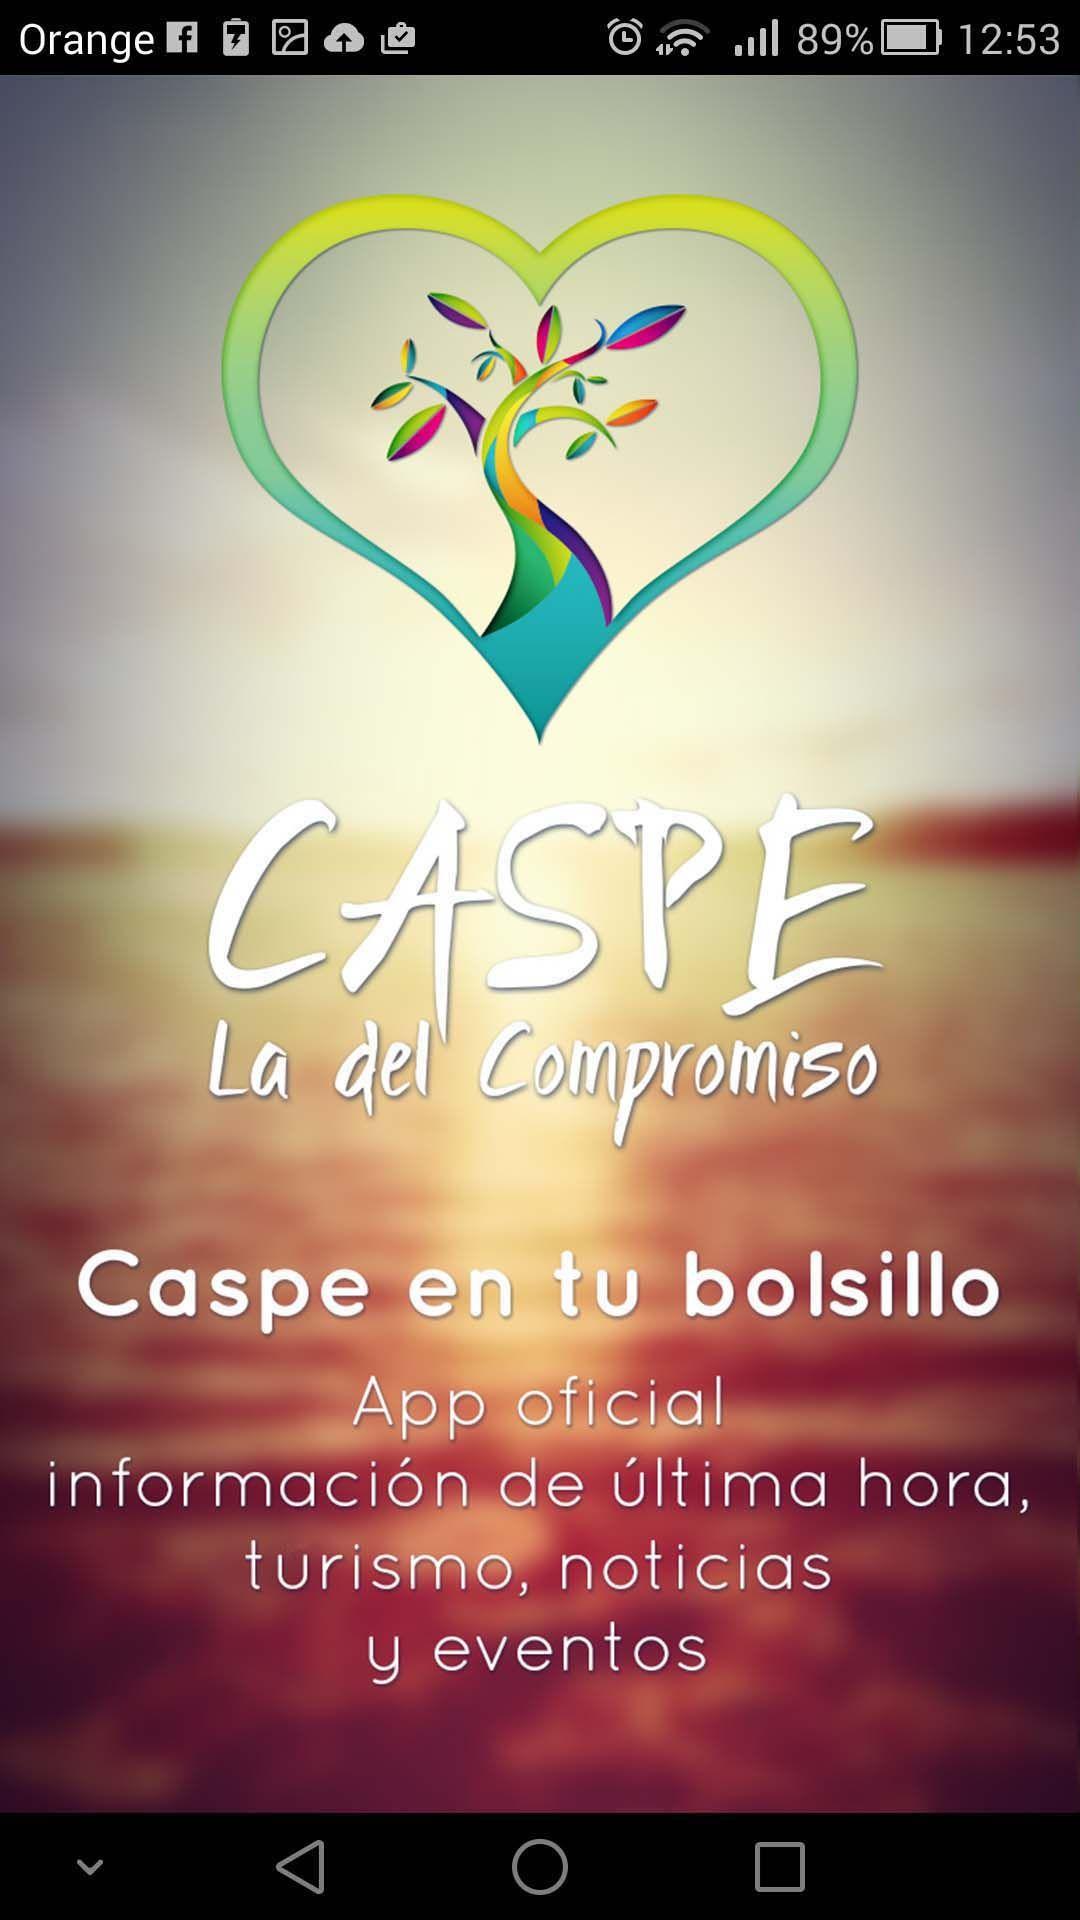 pantallazo_app_caspe_entu_bolsillo_01